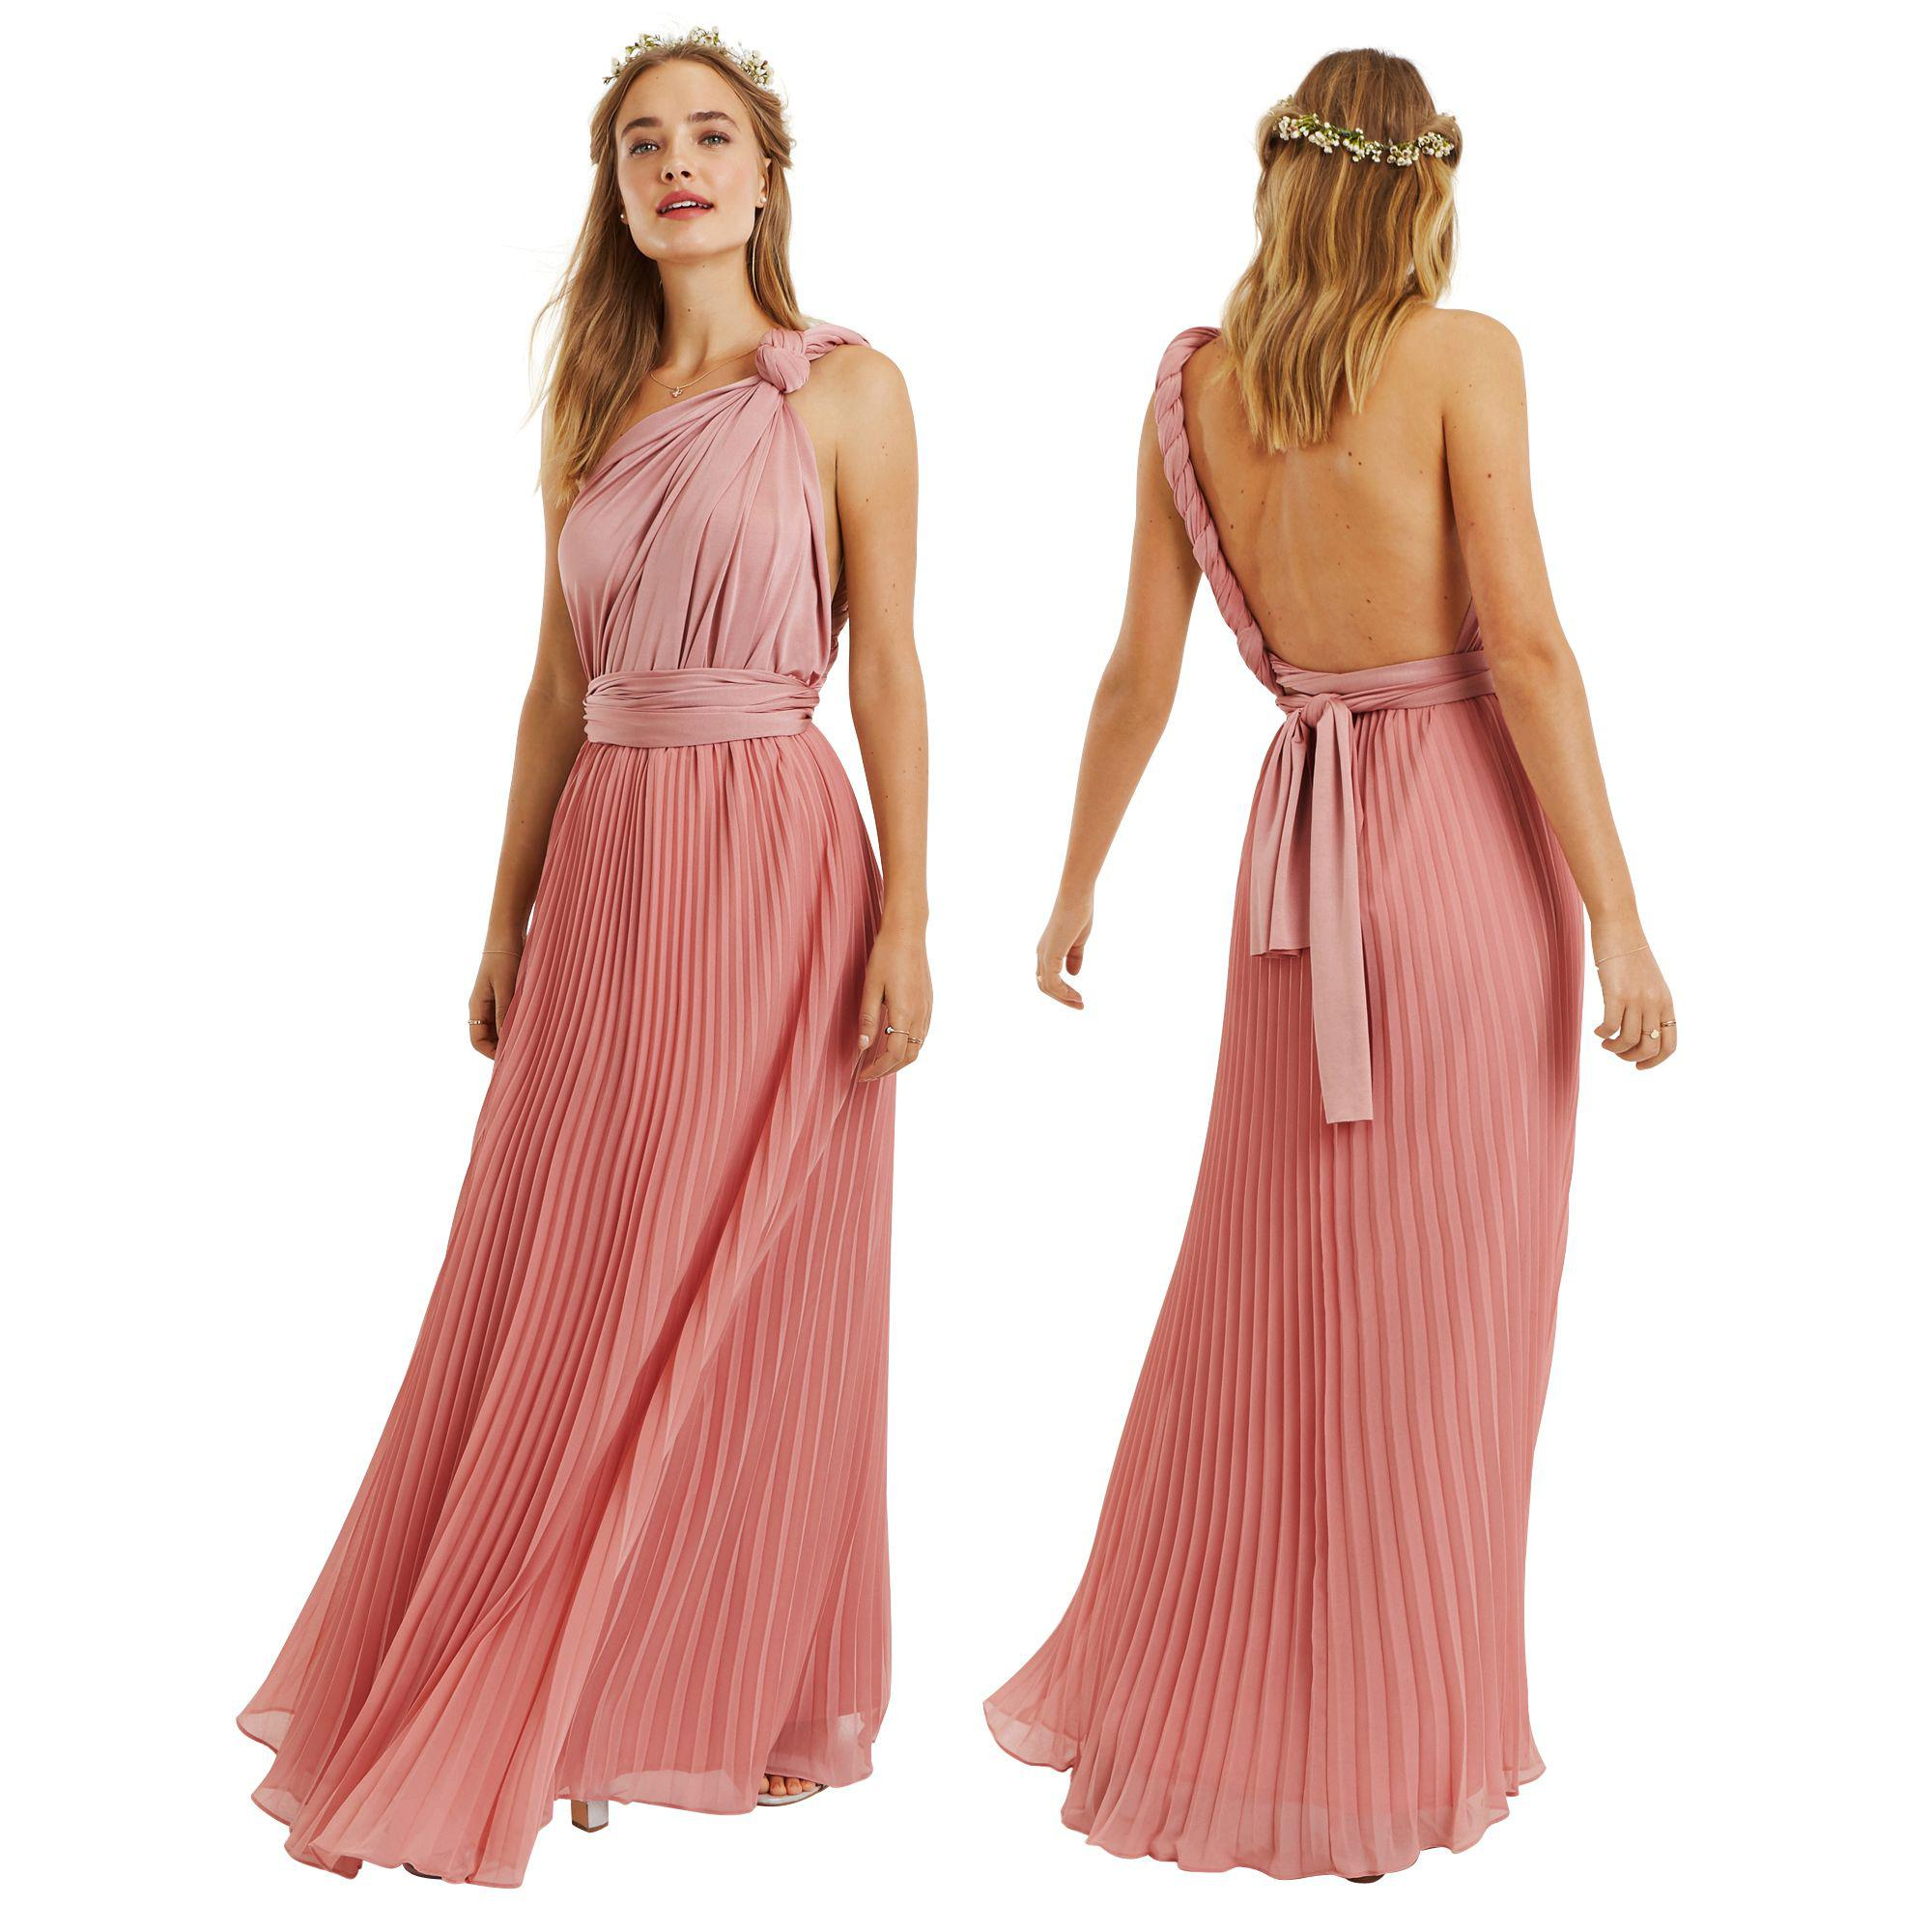 79d7b18589f2 Oasis - Pale Pink Wear It Your Way Pleated Maxi Dress - Lyst. View  fullscreen